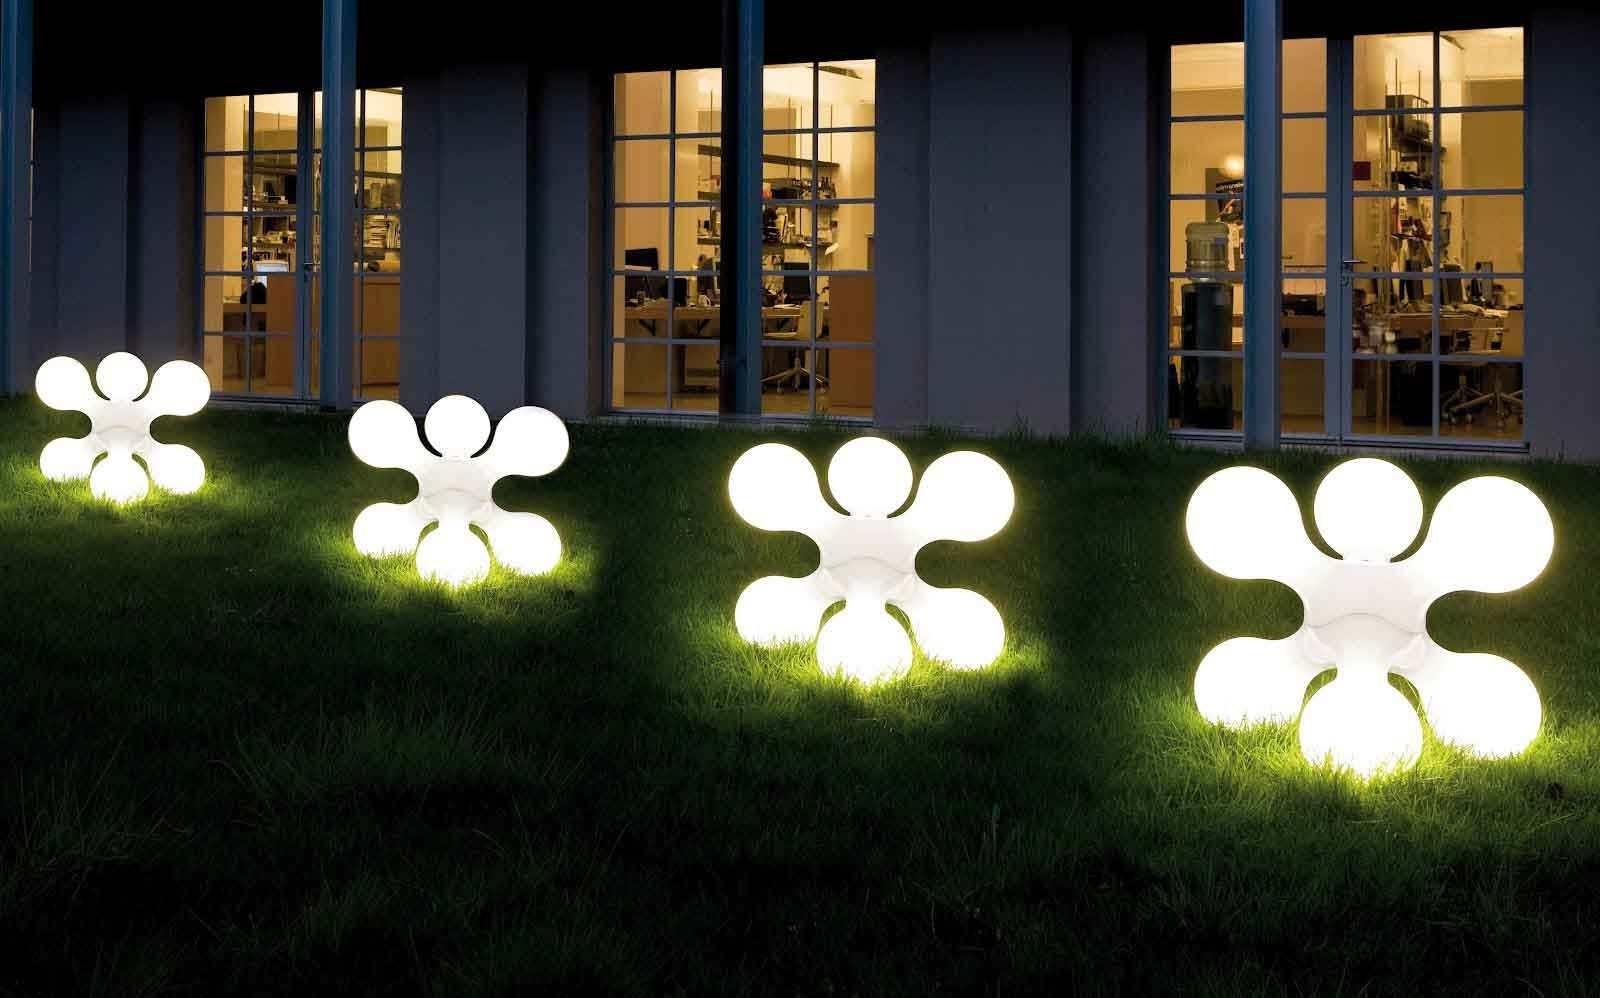 Contemporary Solar Garden Lighting Fixtures Regarding Best And Newest Outdoor Lighting: Trendy Outdoor Lighting 2018 Collection Solar Wall (View 9 of 20)